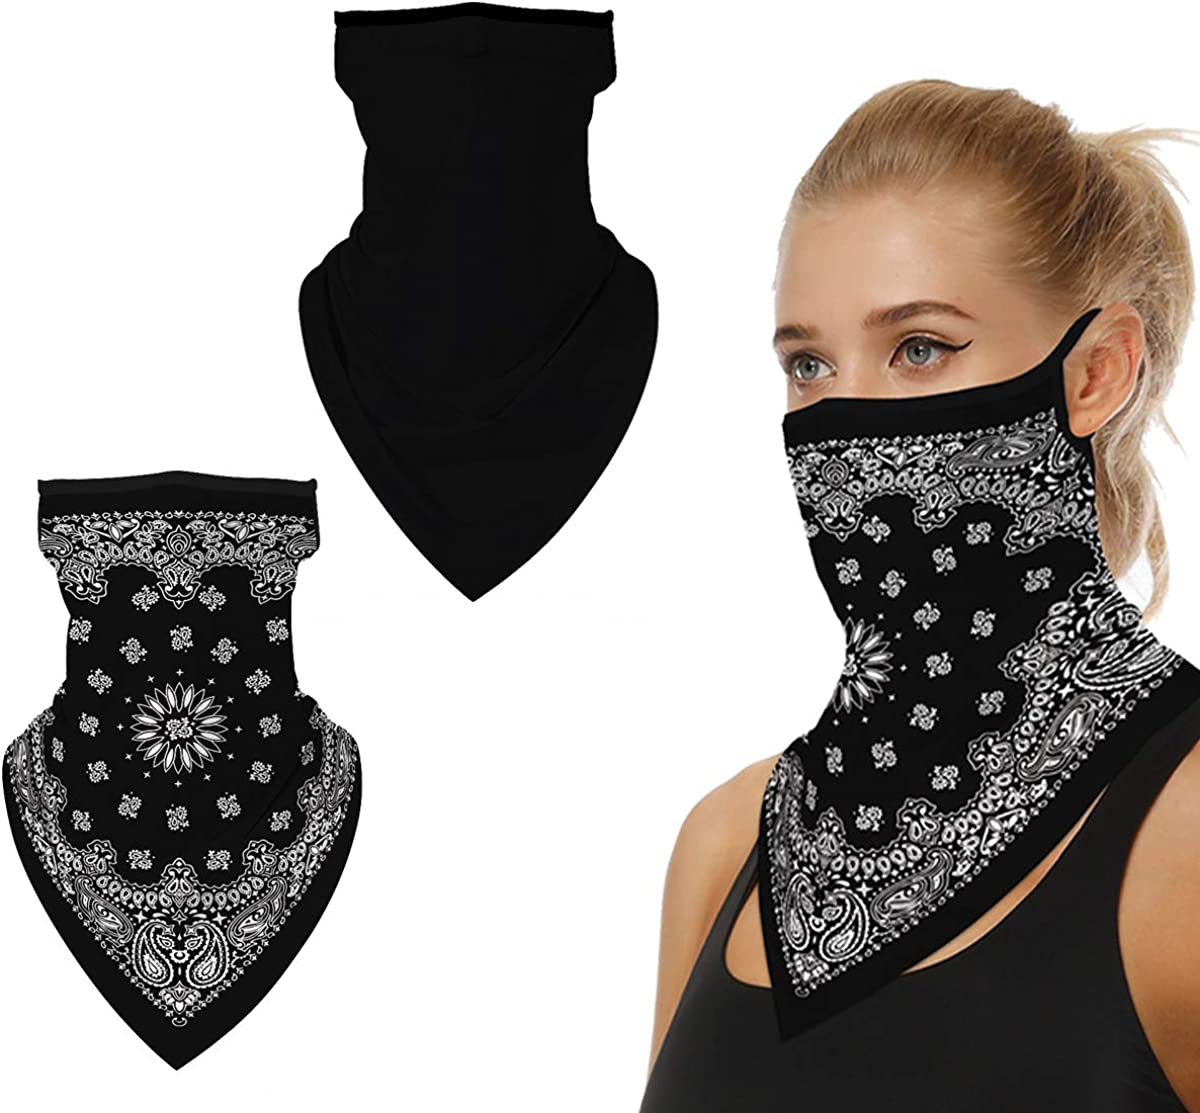 Face Scarf Bandana Mask Ear Loops Face Balaclava Cover Bandana Men Women UV Sun, Wind Protection